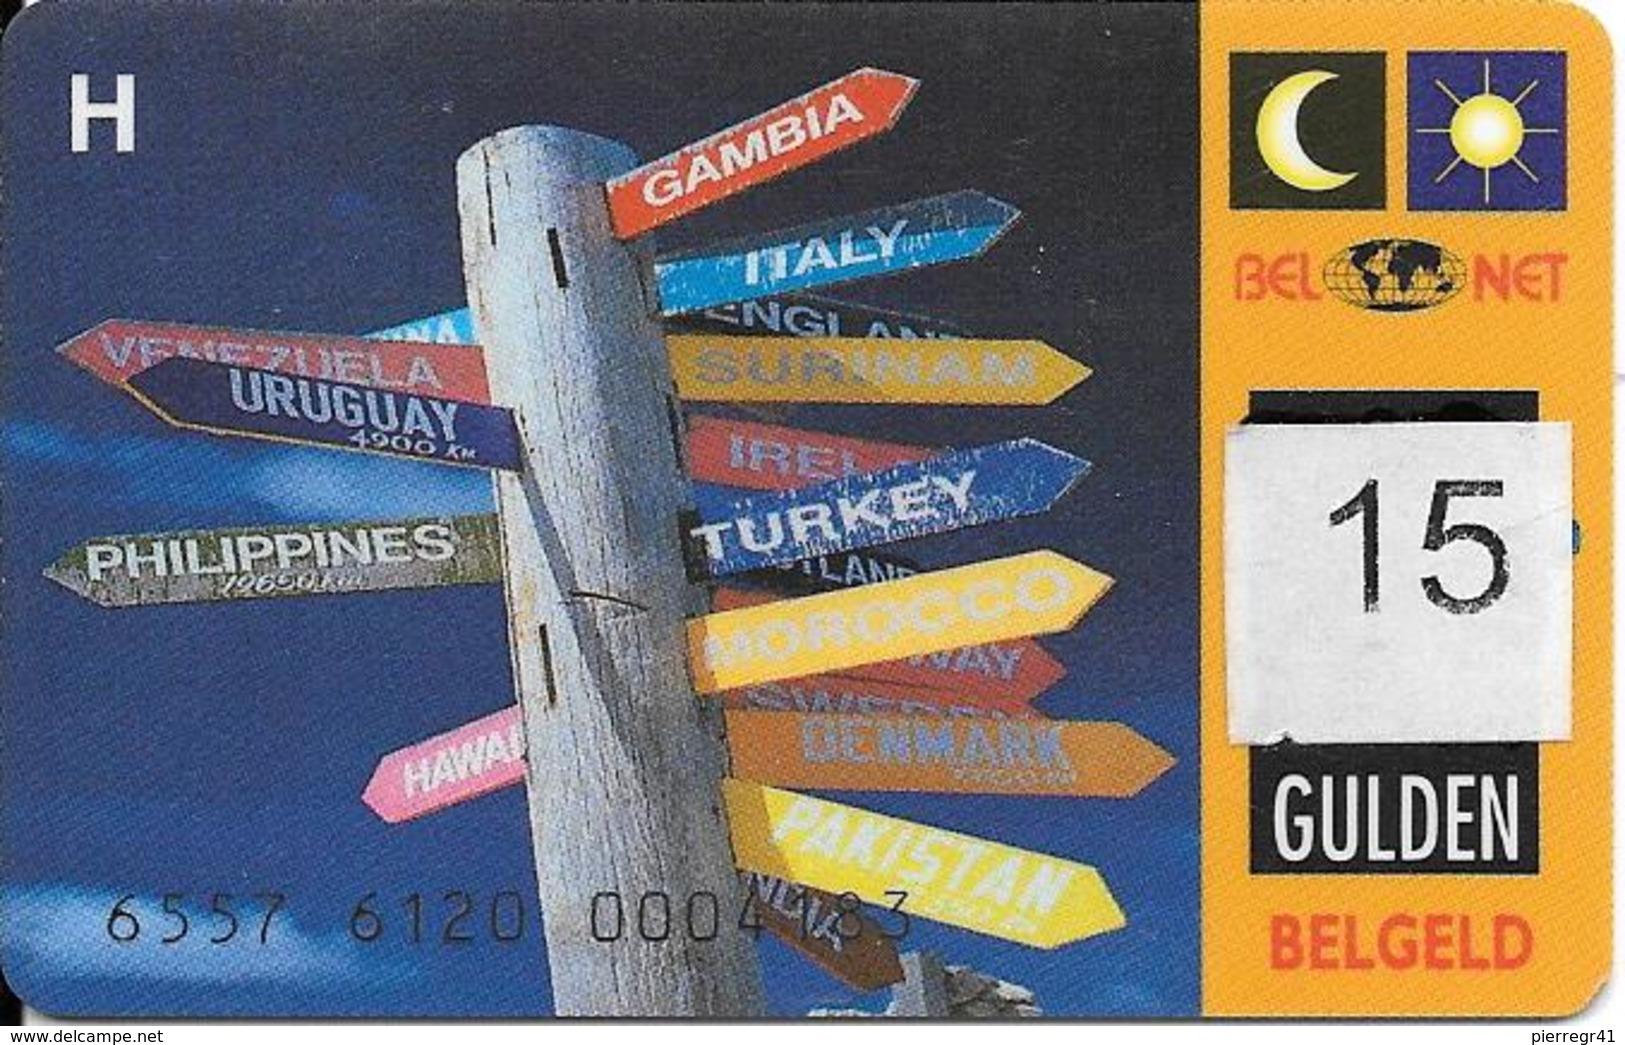 CARTE-PREPAYEE-BELGE-BELGELD-15 GULDEN-R° N° Gravés-Plastic Epais-TBE-RARE - Belgique